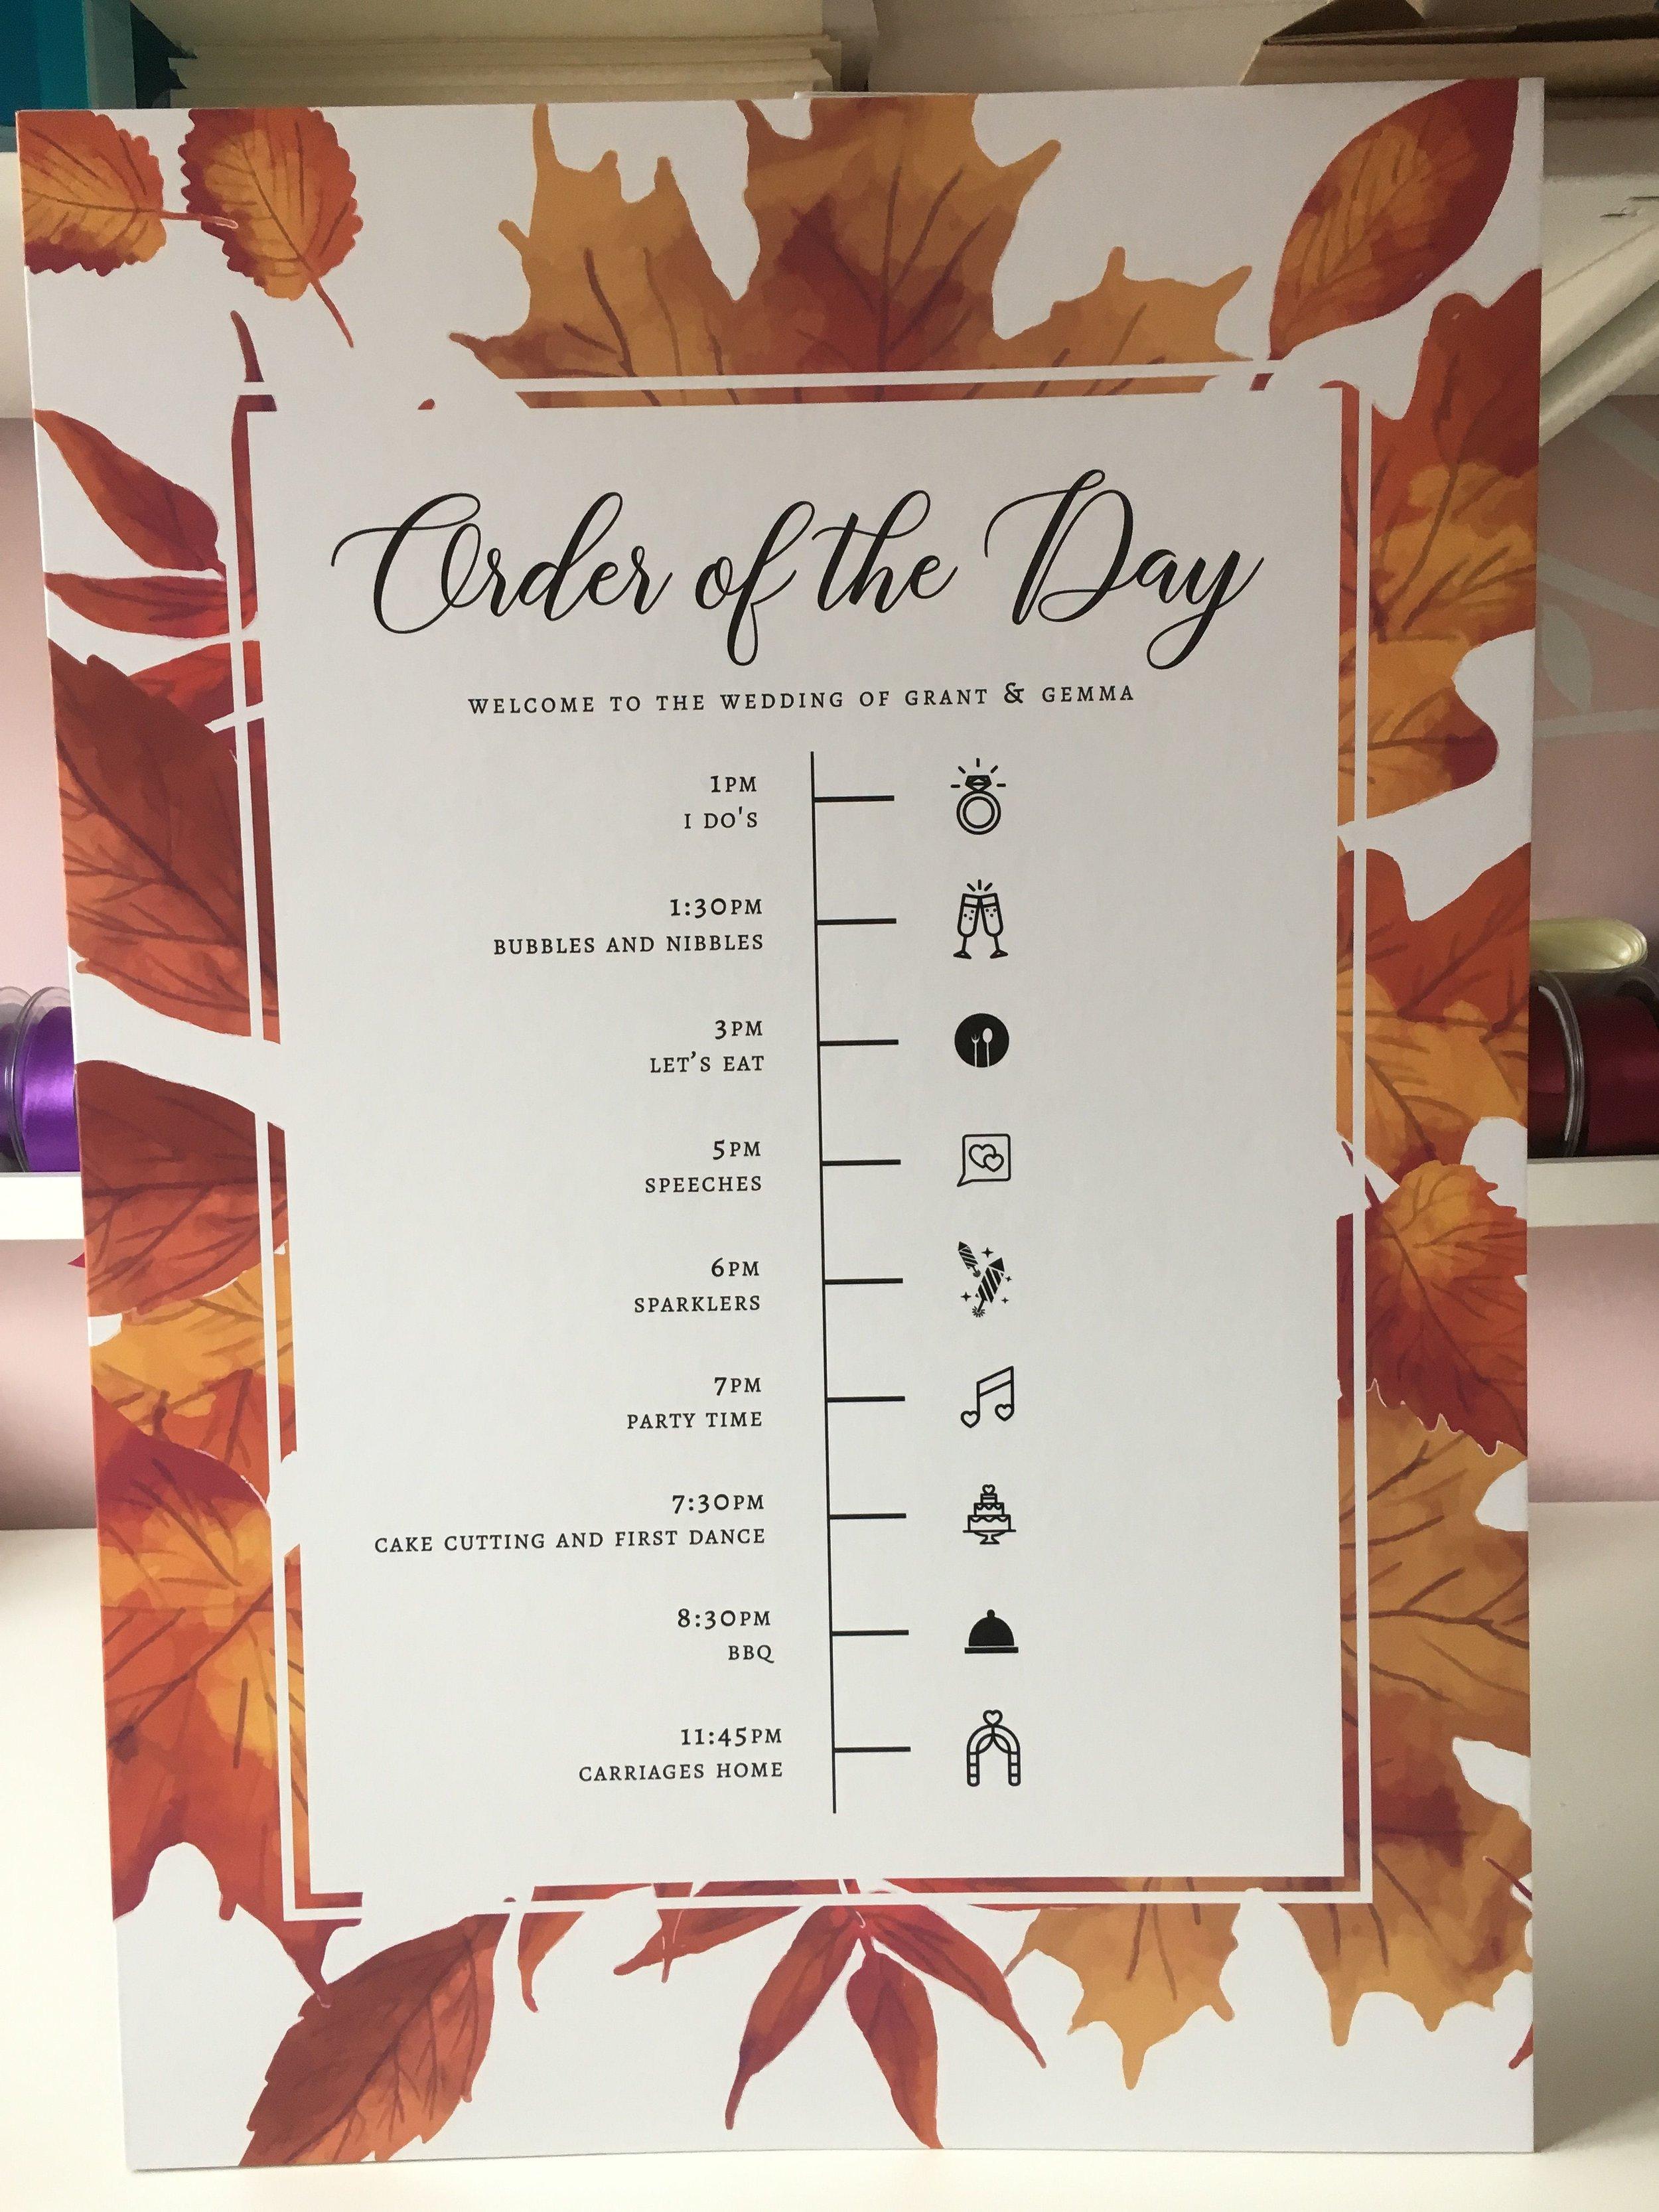 G&G - Order of the Day.jpg